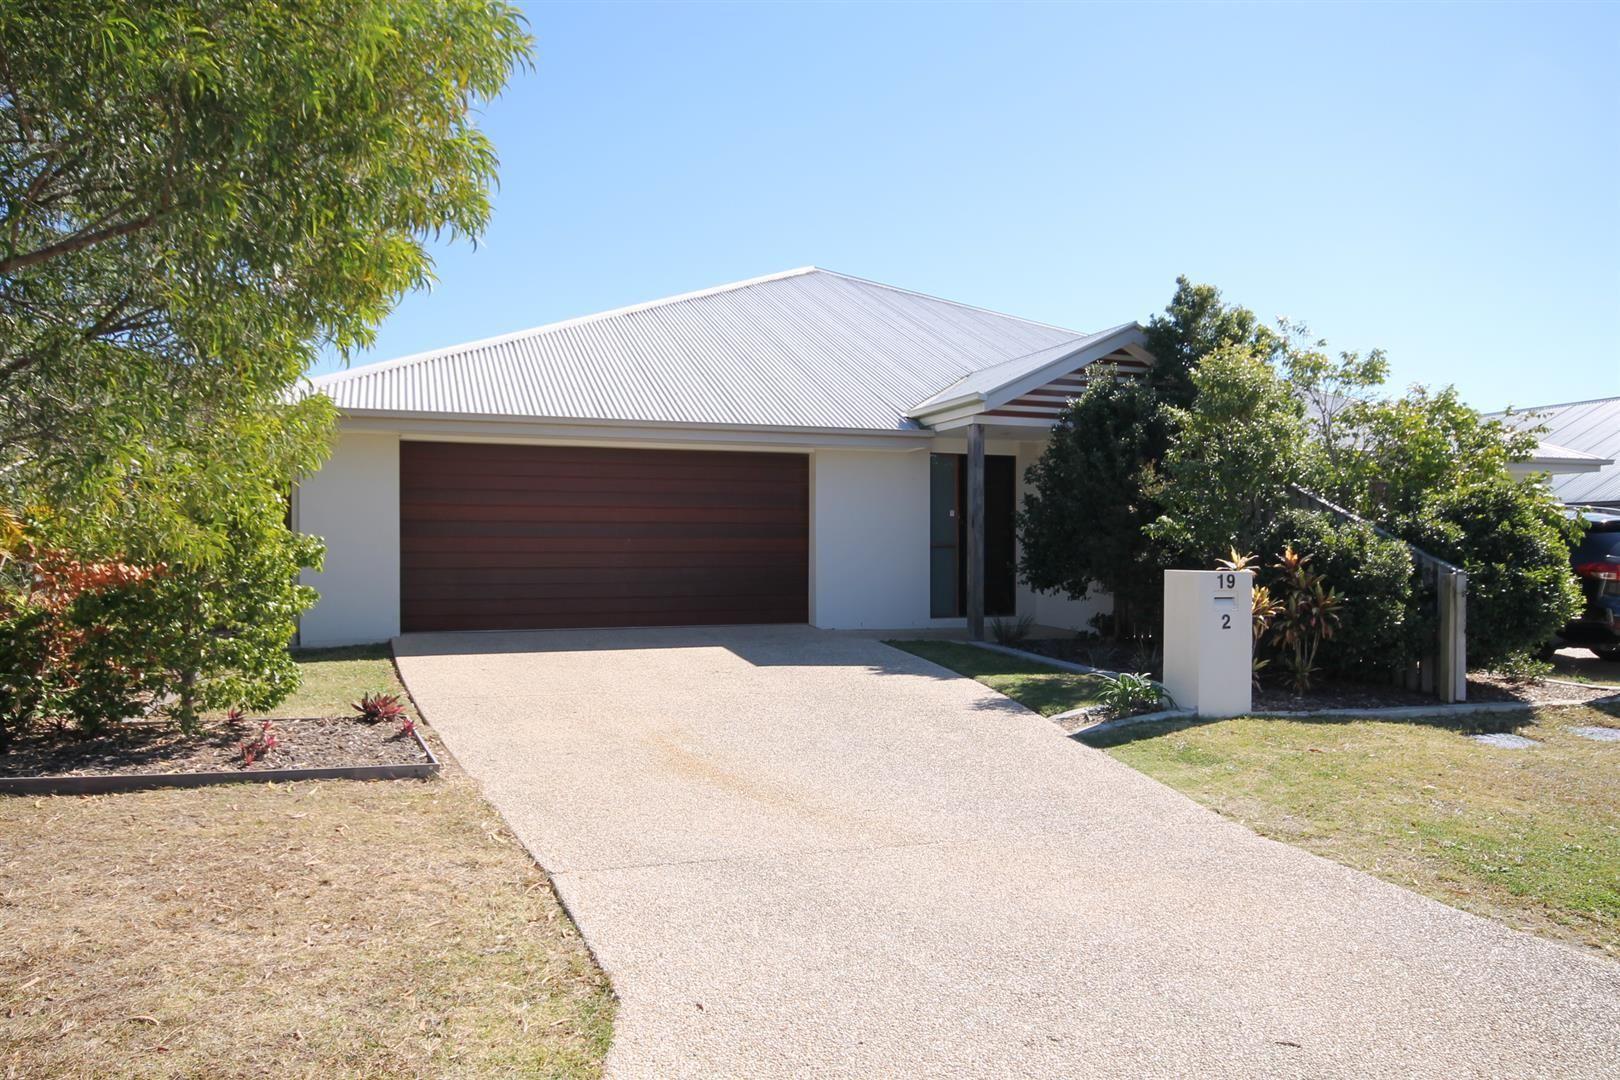 2/19 Conestoga Way, Upper Coomera QLD 4209, Image 0